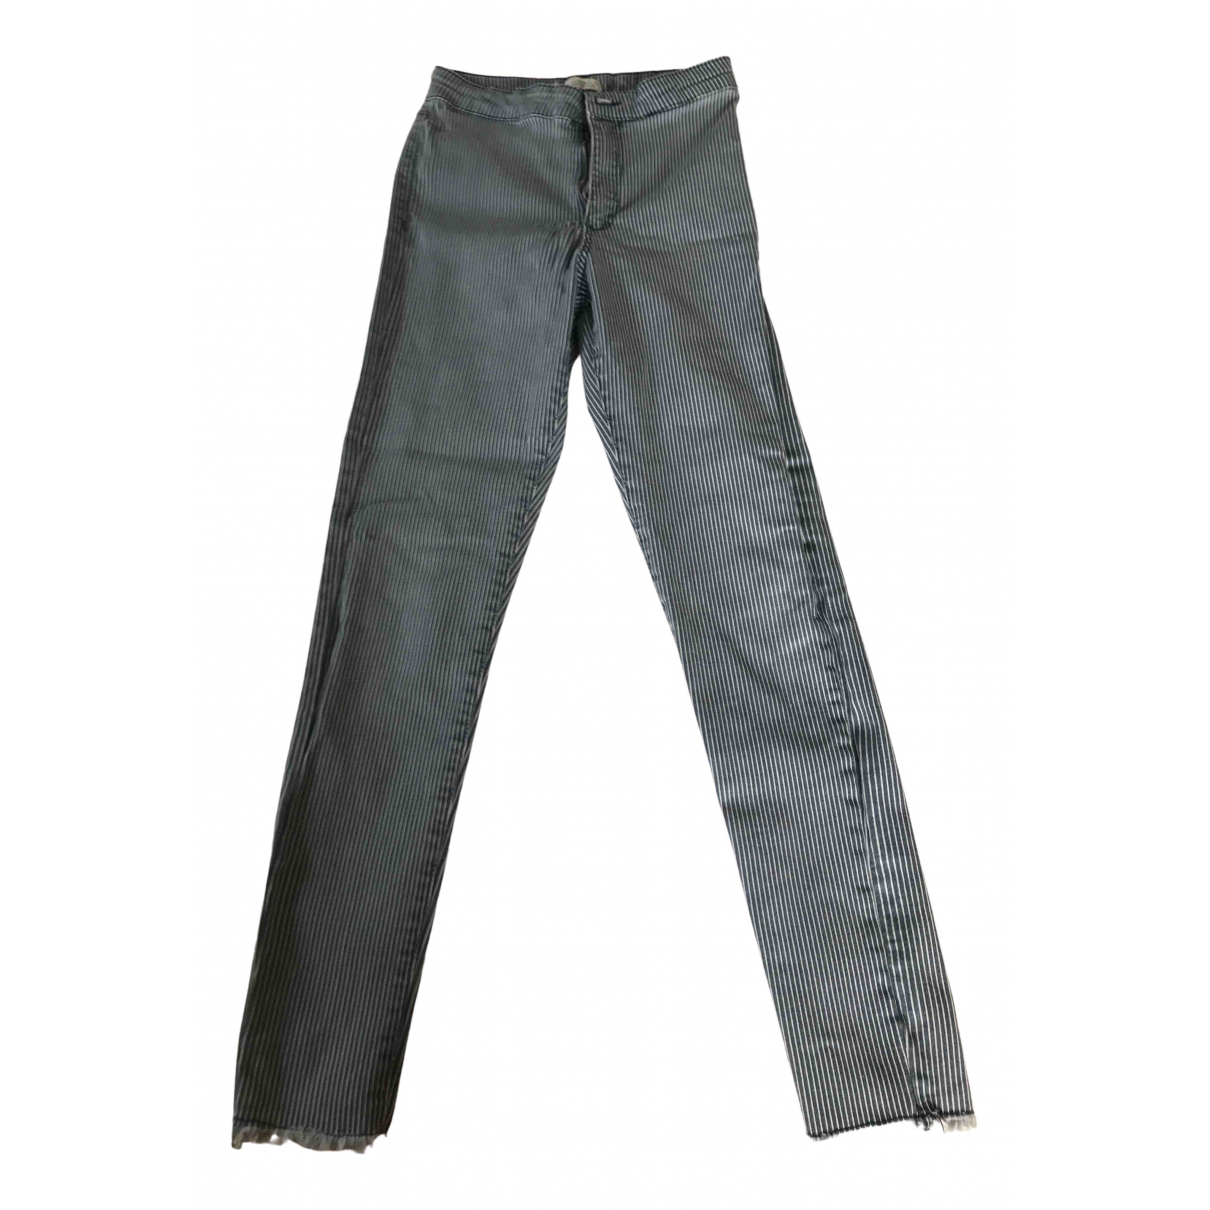 Zara N Blue Denim - Jeans Trousers for Kids 14 years - S FR